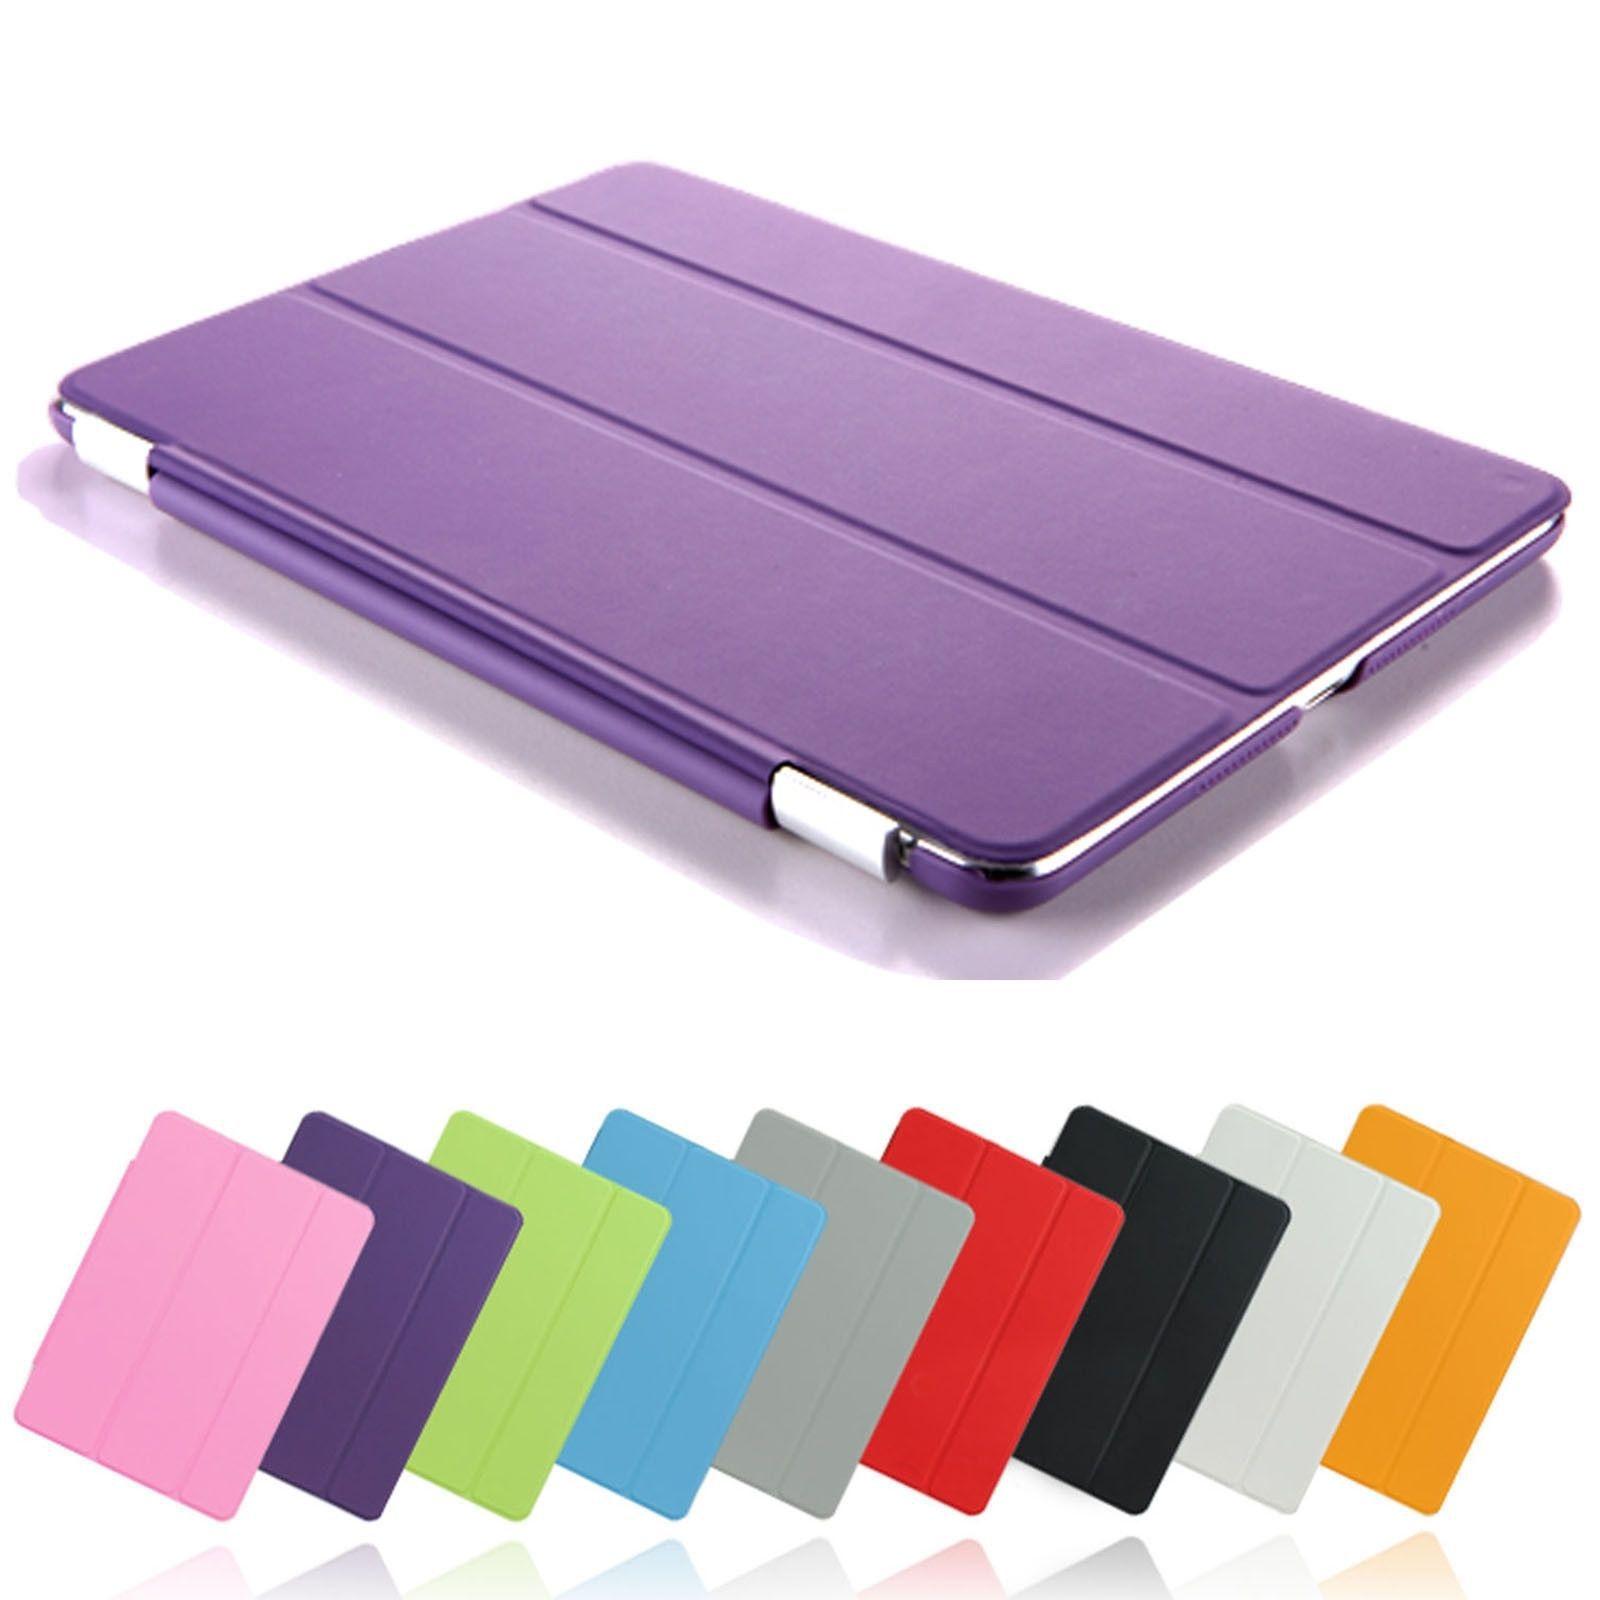 DHL Ultra Slim Magnetic LeatherSmart Co ver Case Protection For iPad 2 3 4 5 iPad Mini Mini4 Pro Retina Folding Stand Case Auto Sleep Wake